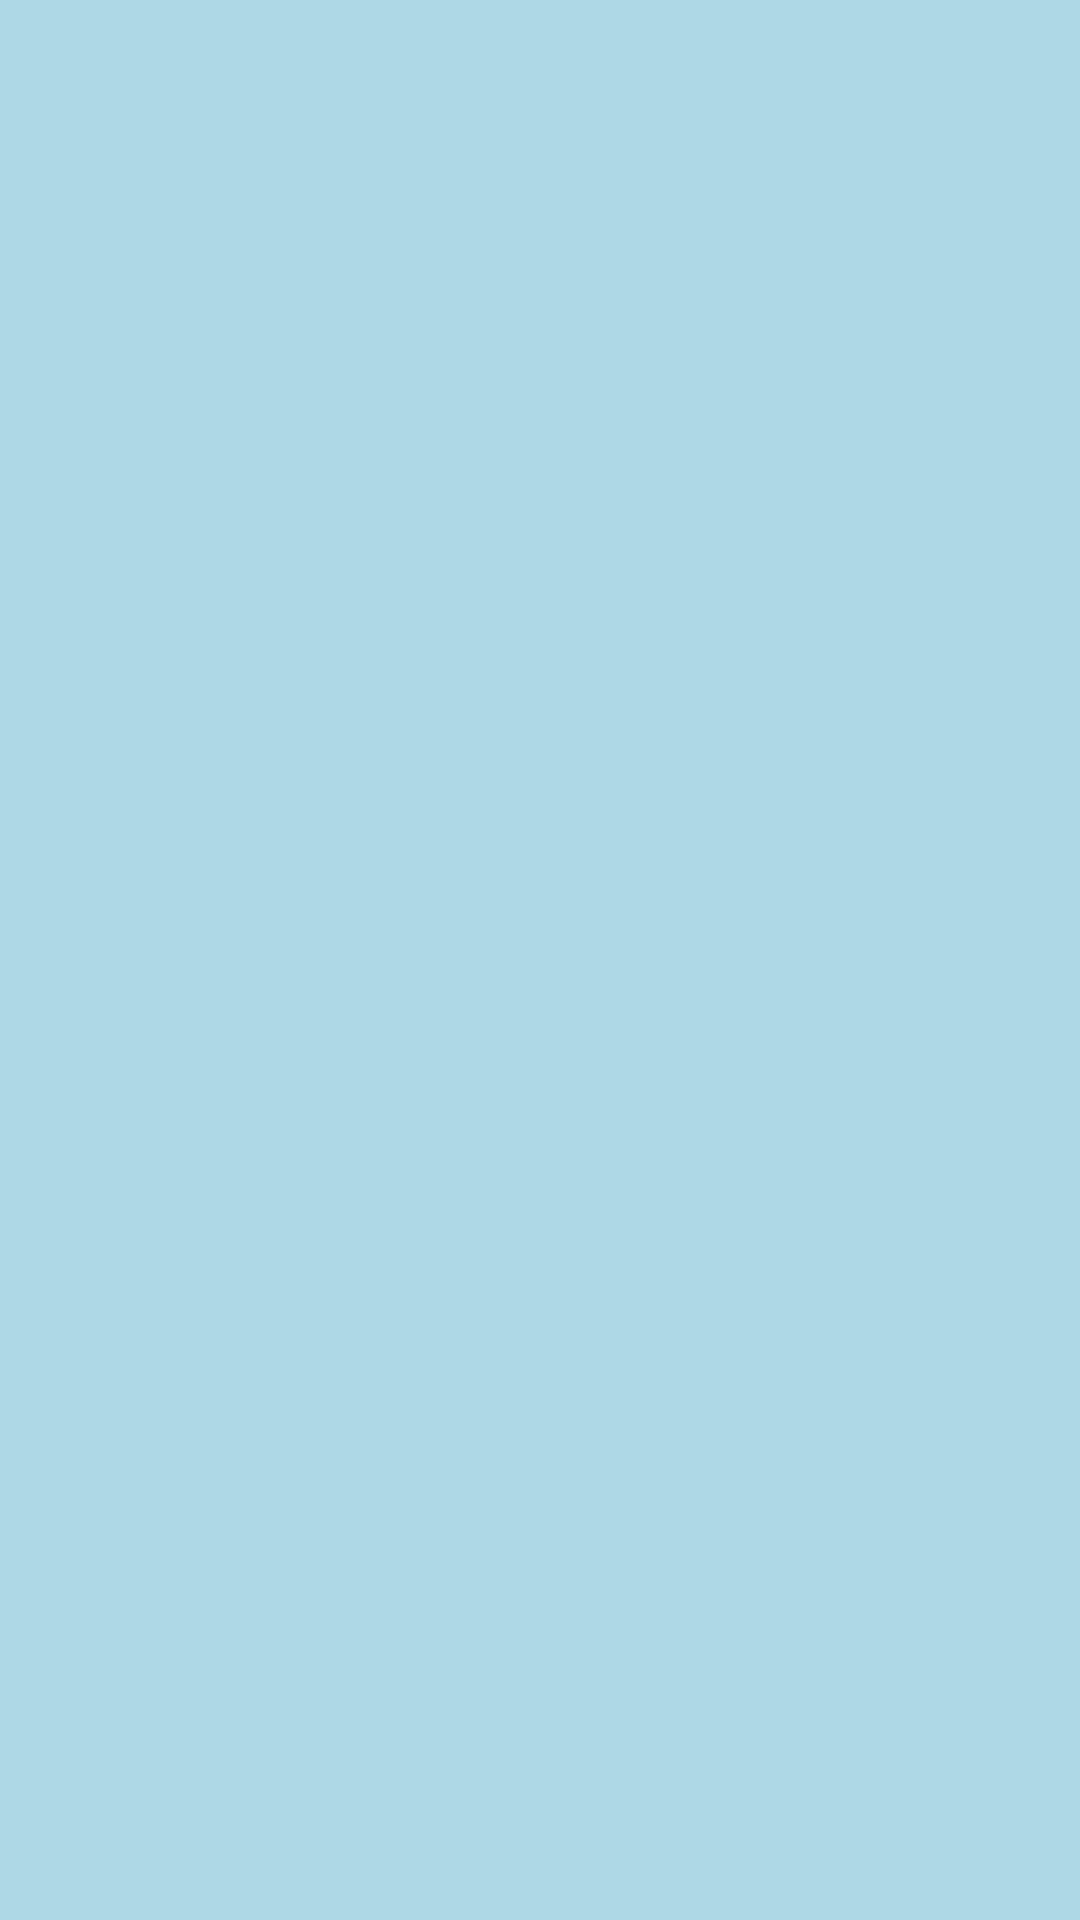 1080x1920 Light Blue Solid Color Background